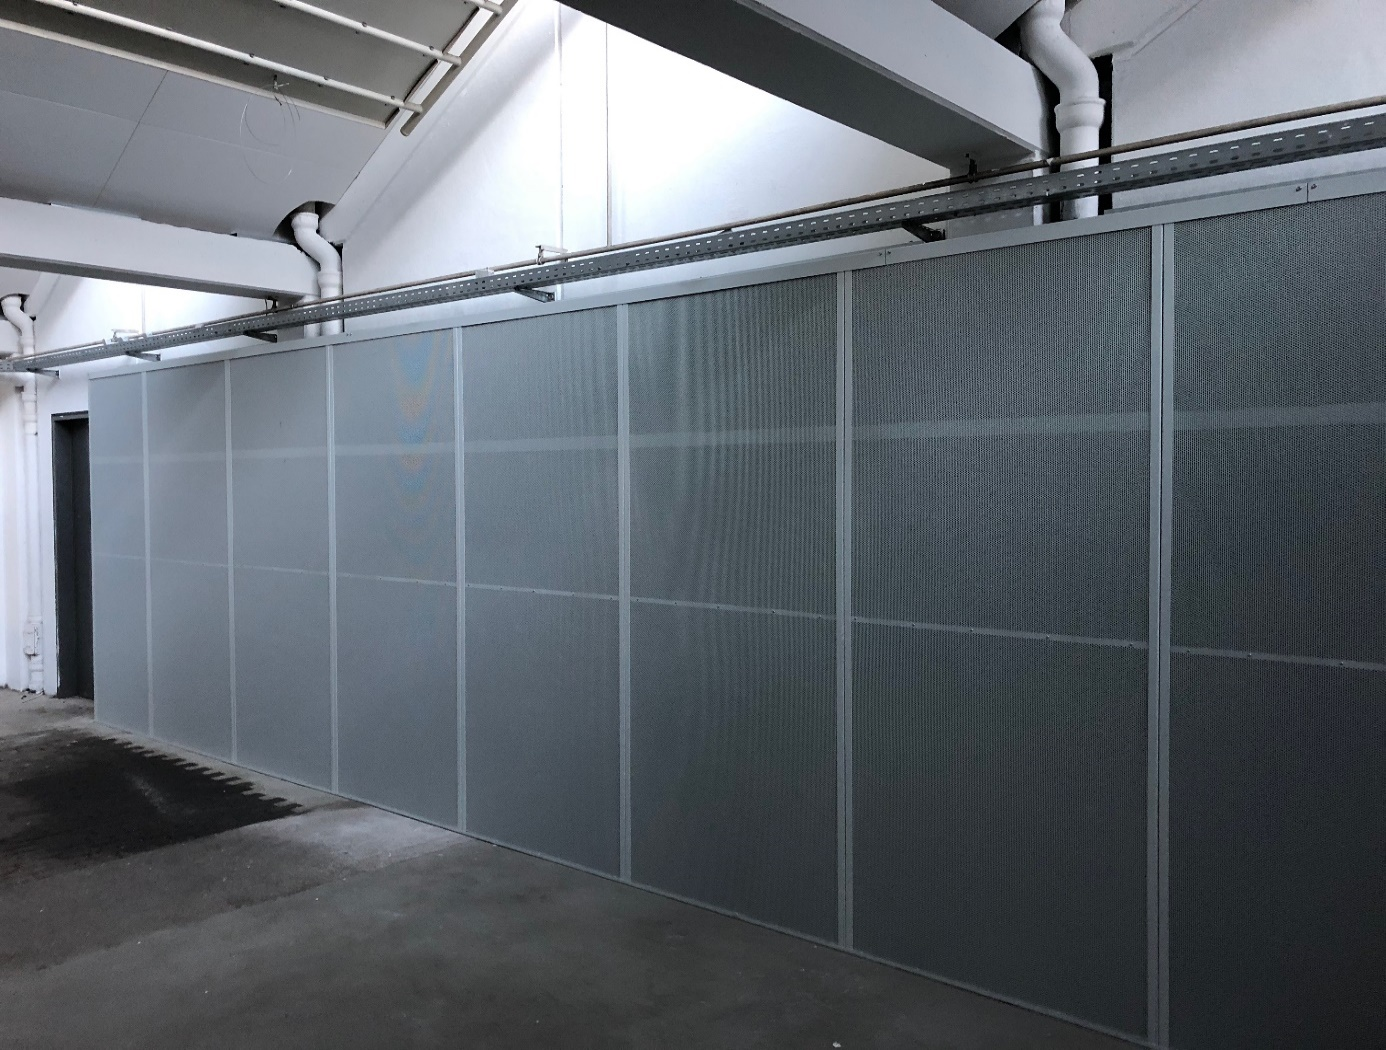 Schallschutzwände (massiv, Wandstärke 100mm)